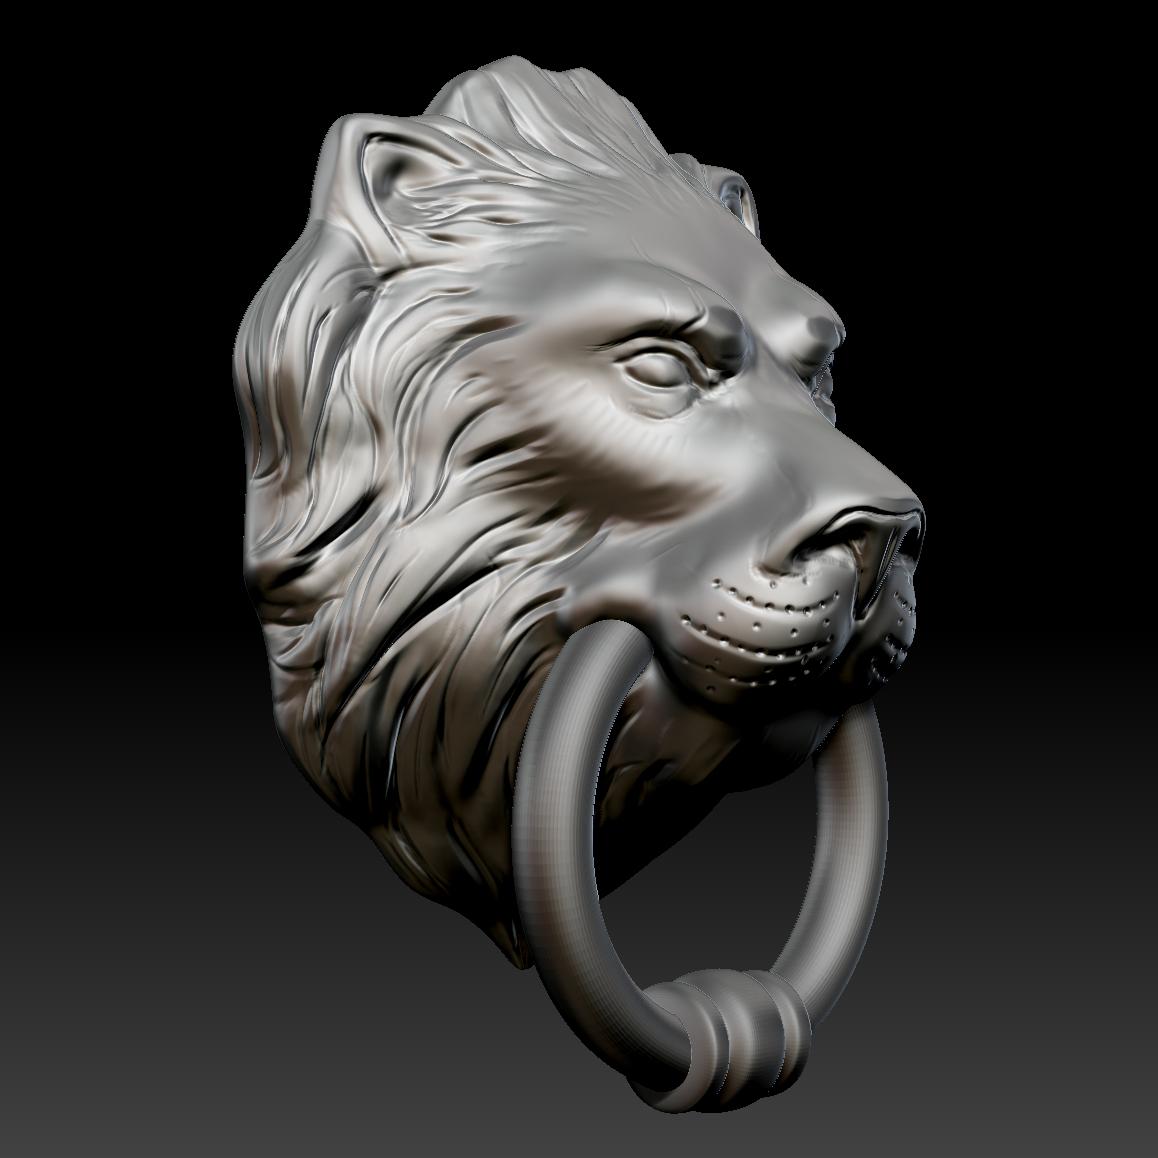 Lion Head Door Knocker 3d Model Game Ready Max Obj Fbx